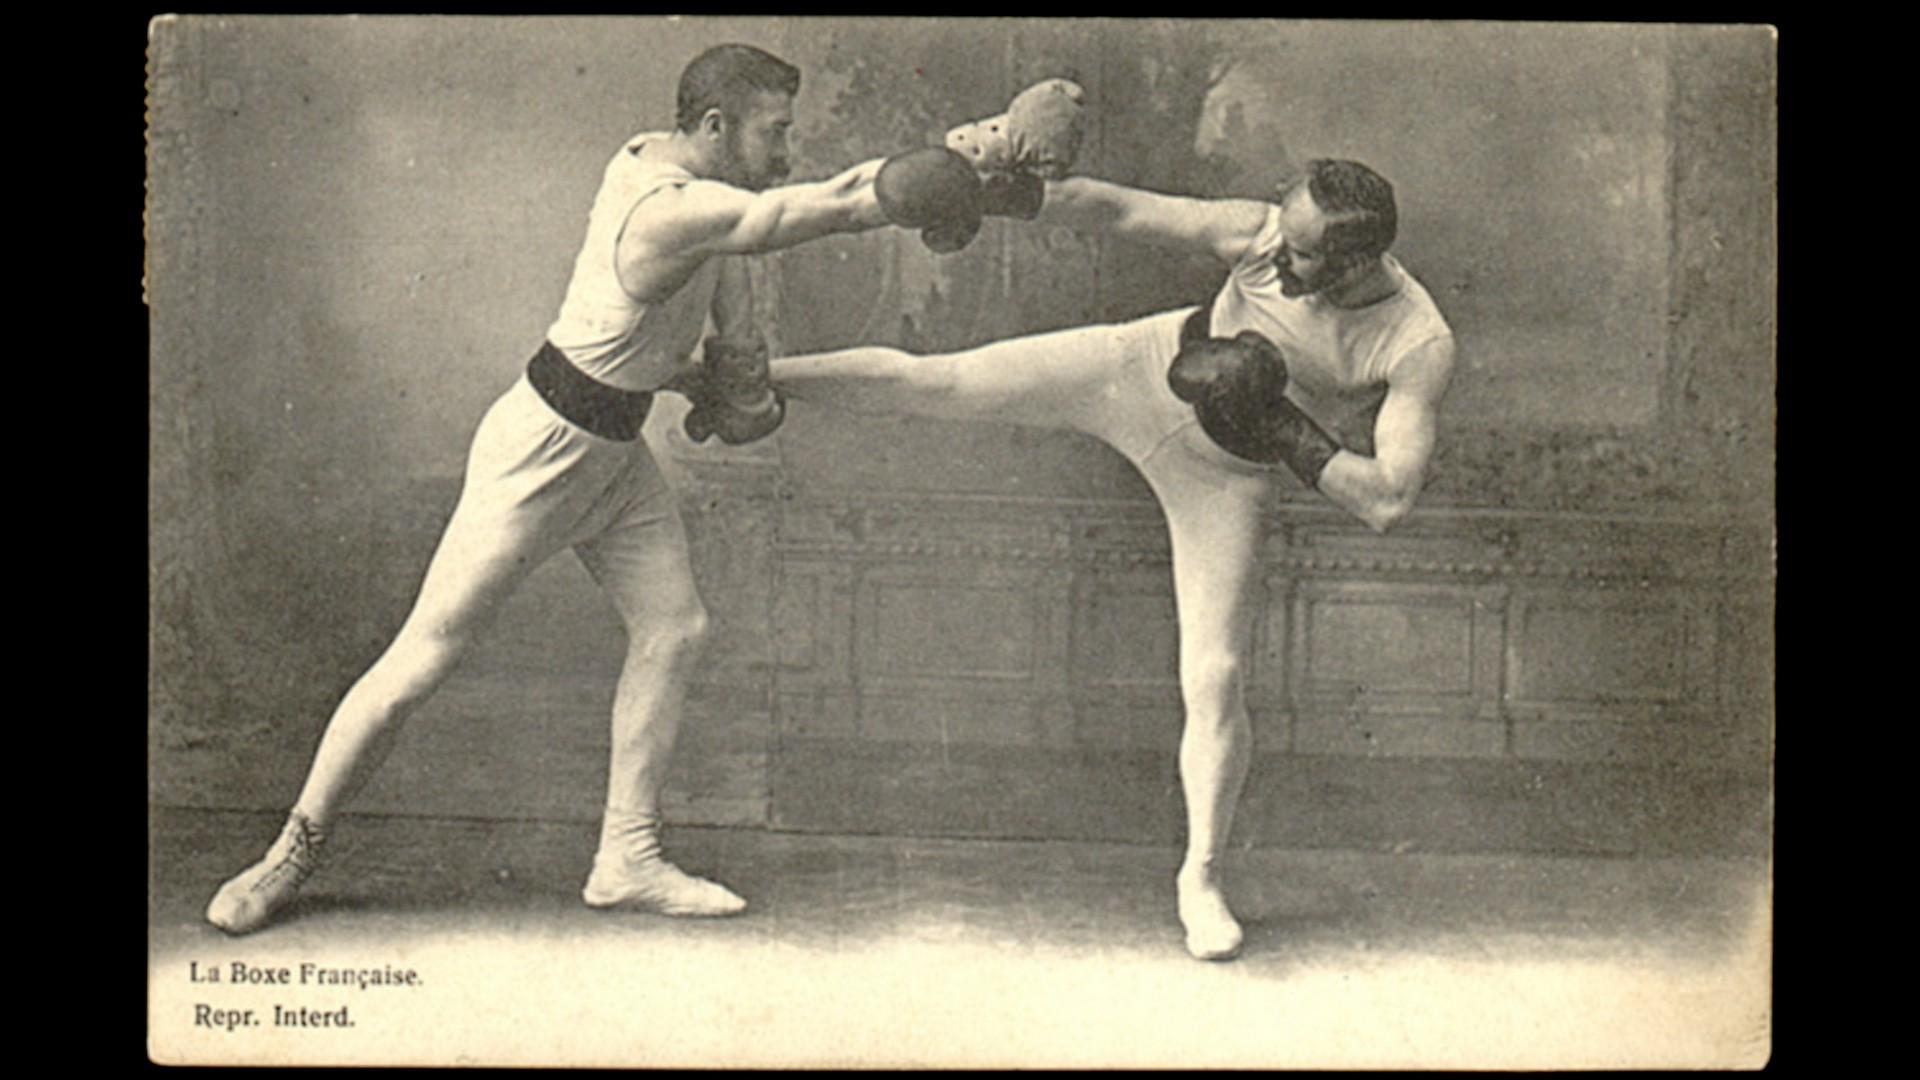 Savate Boxe Française 1900